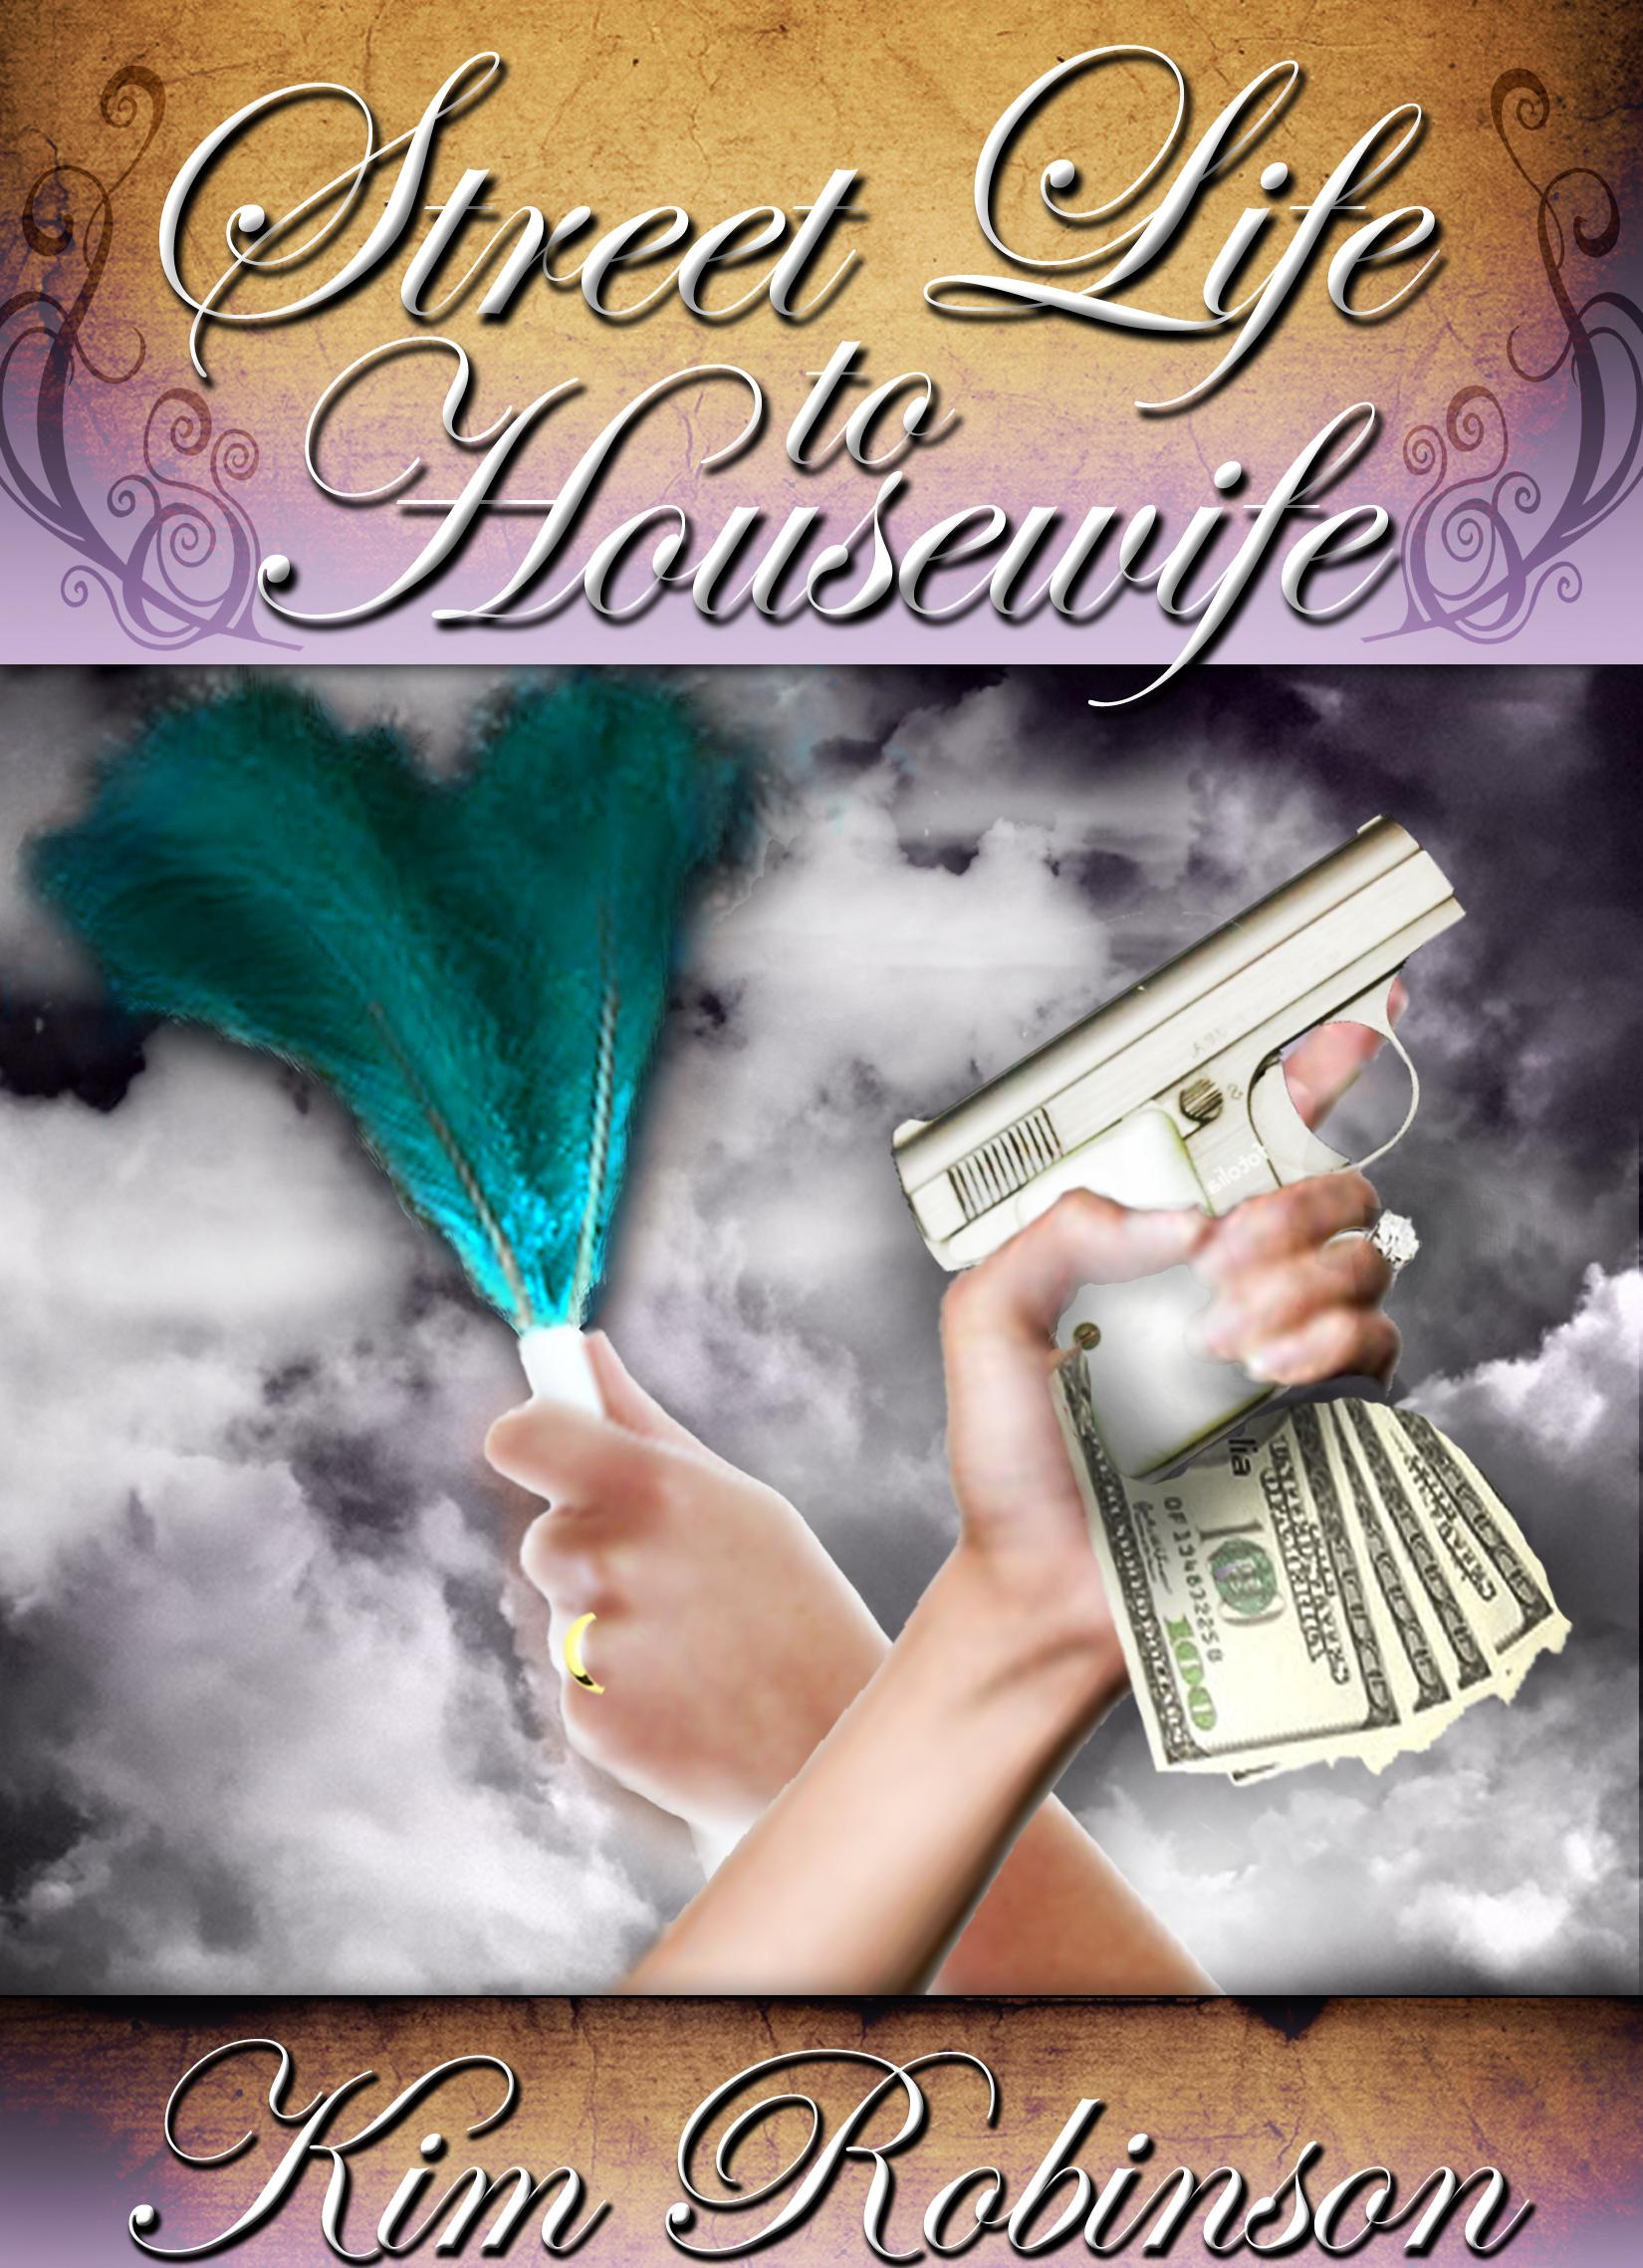 Street Life to Housewife